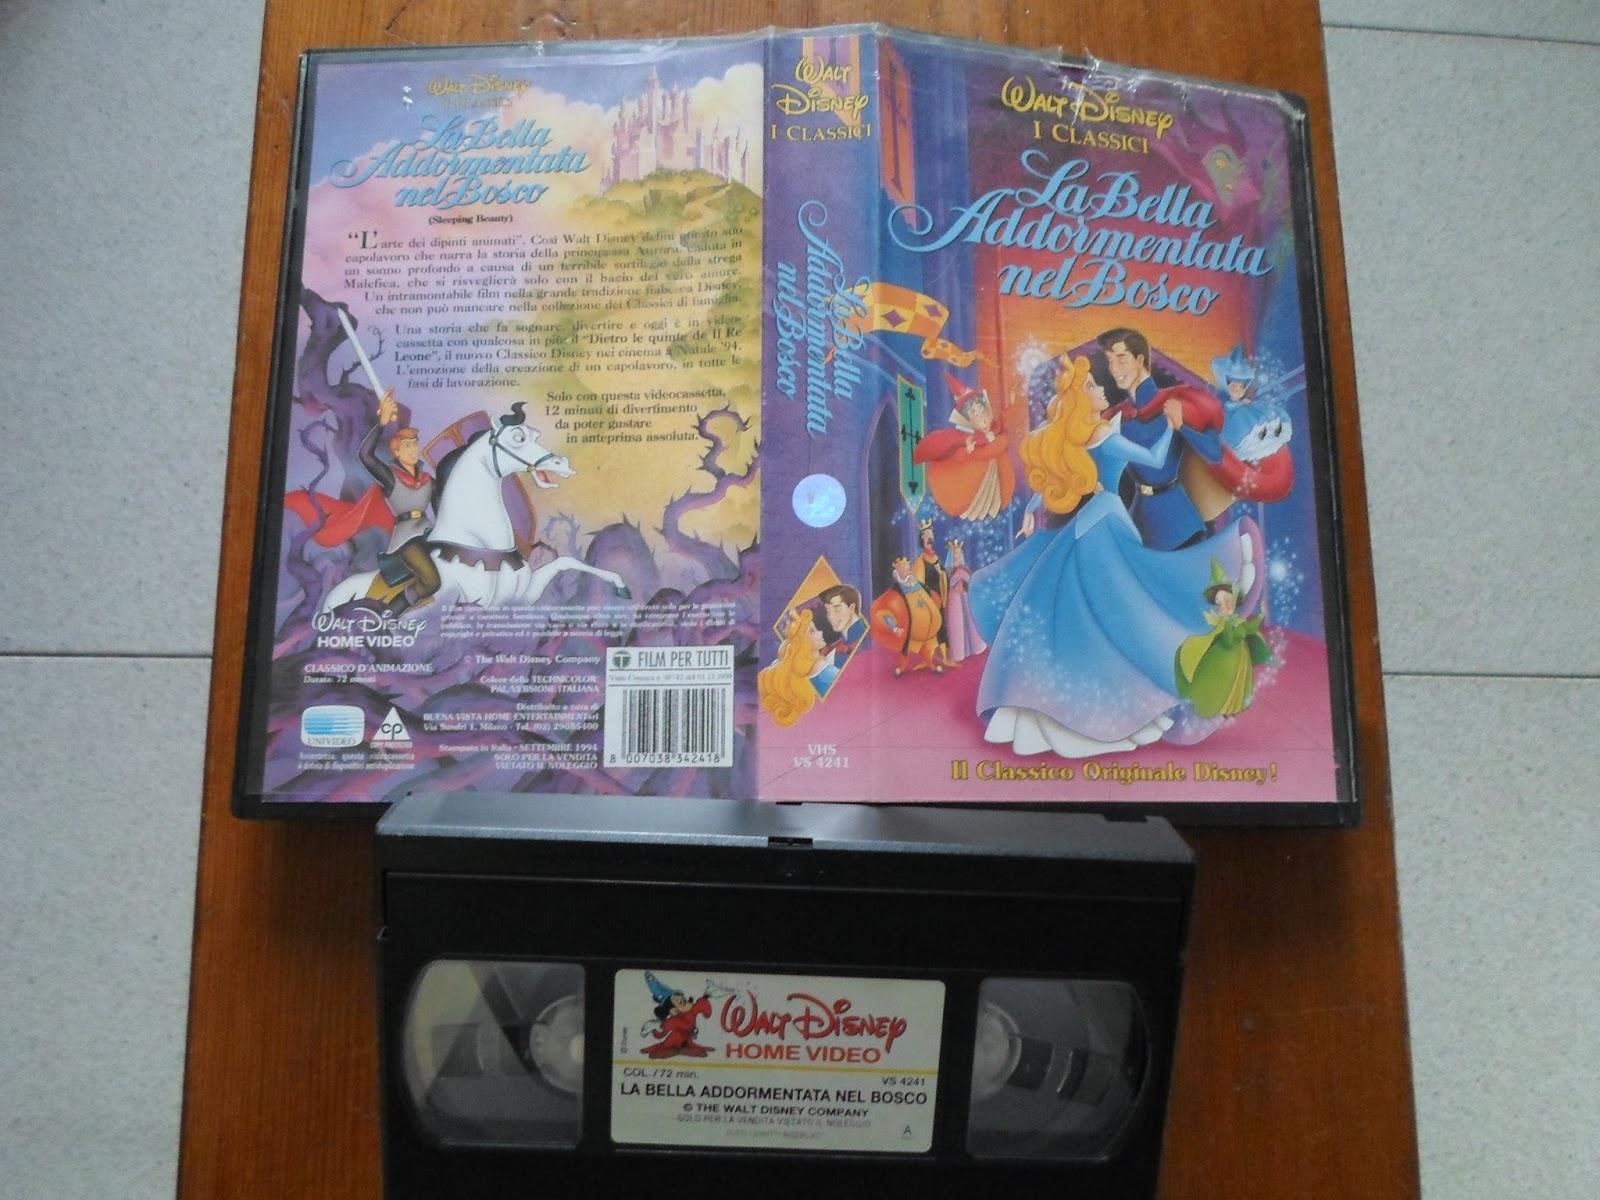 La bella addormentata 1994 full vintage movie - 3 part 5